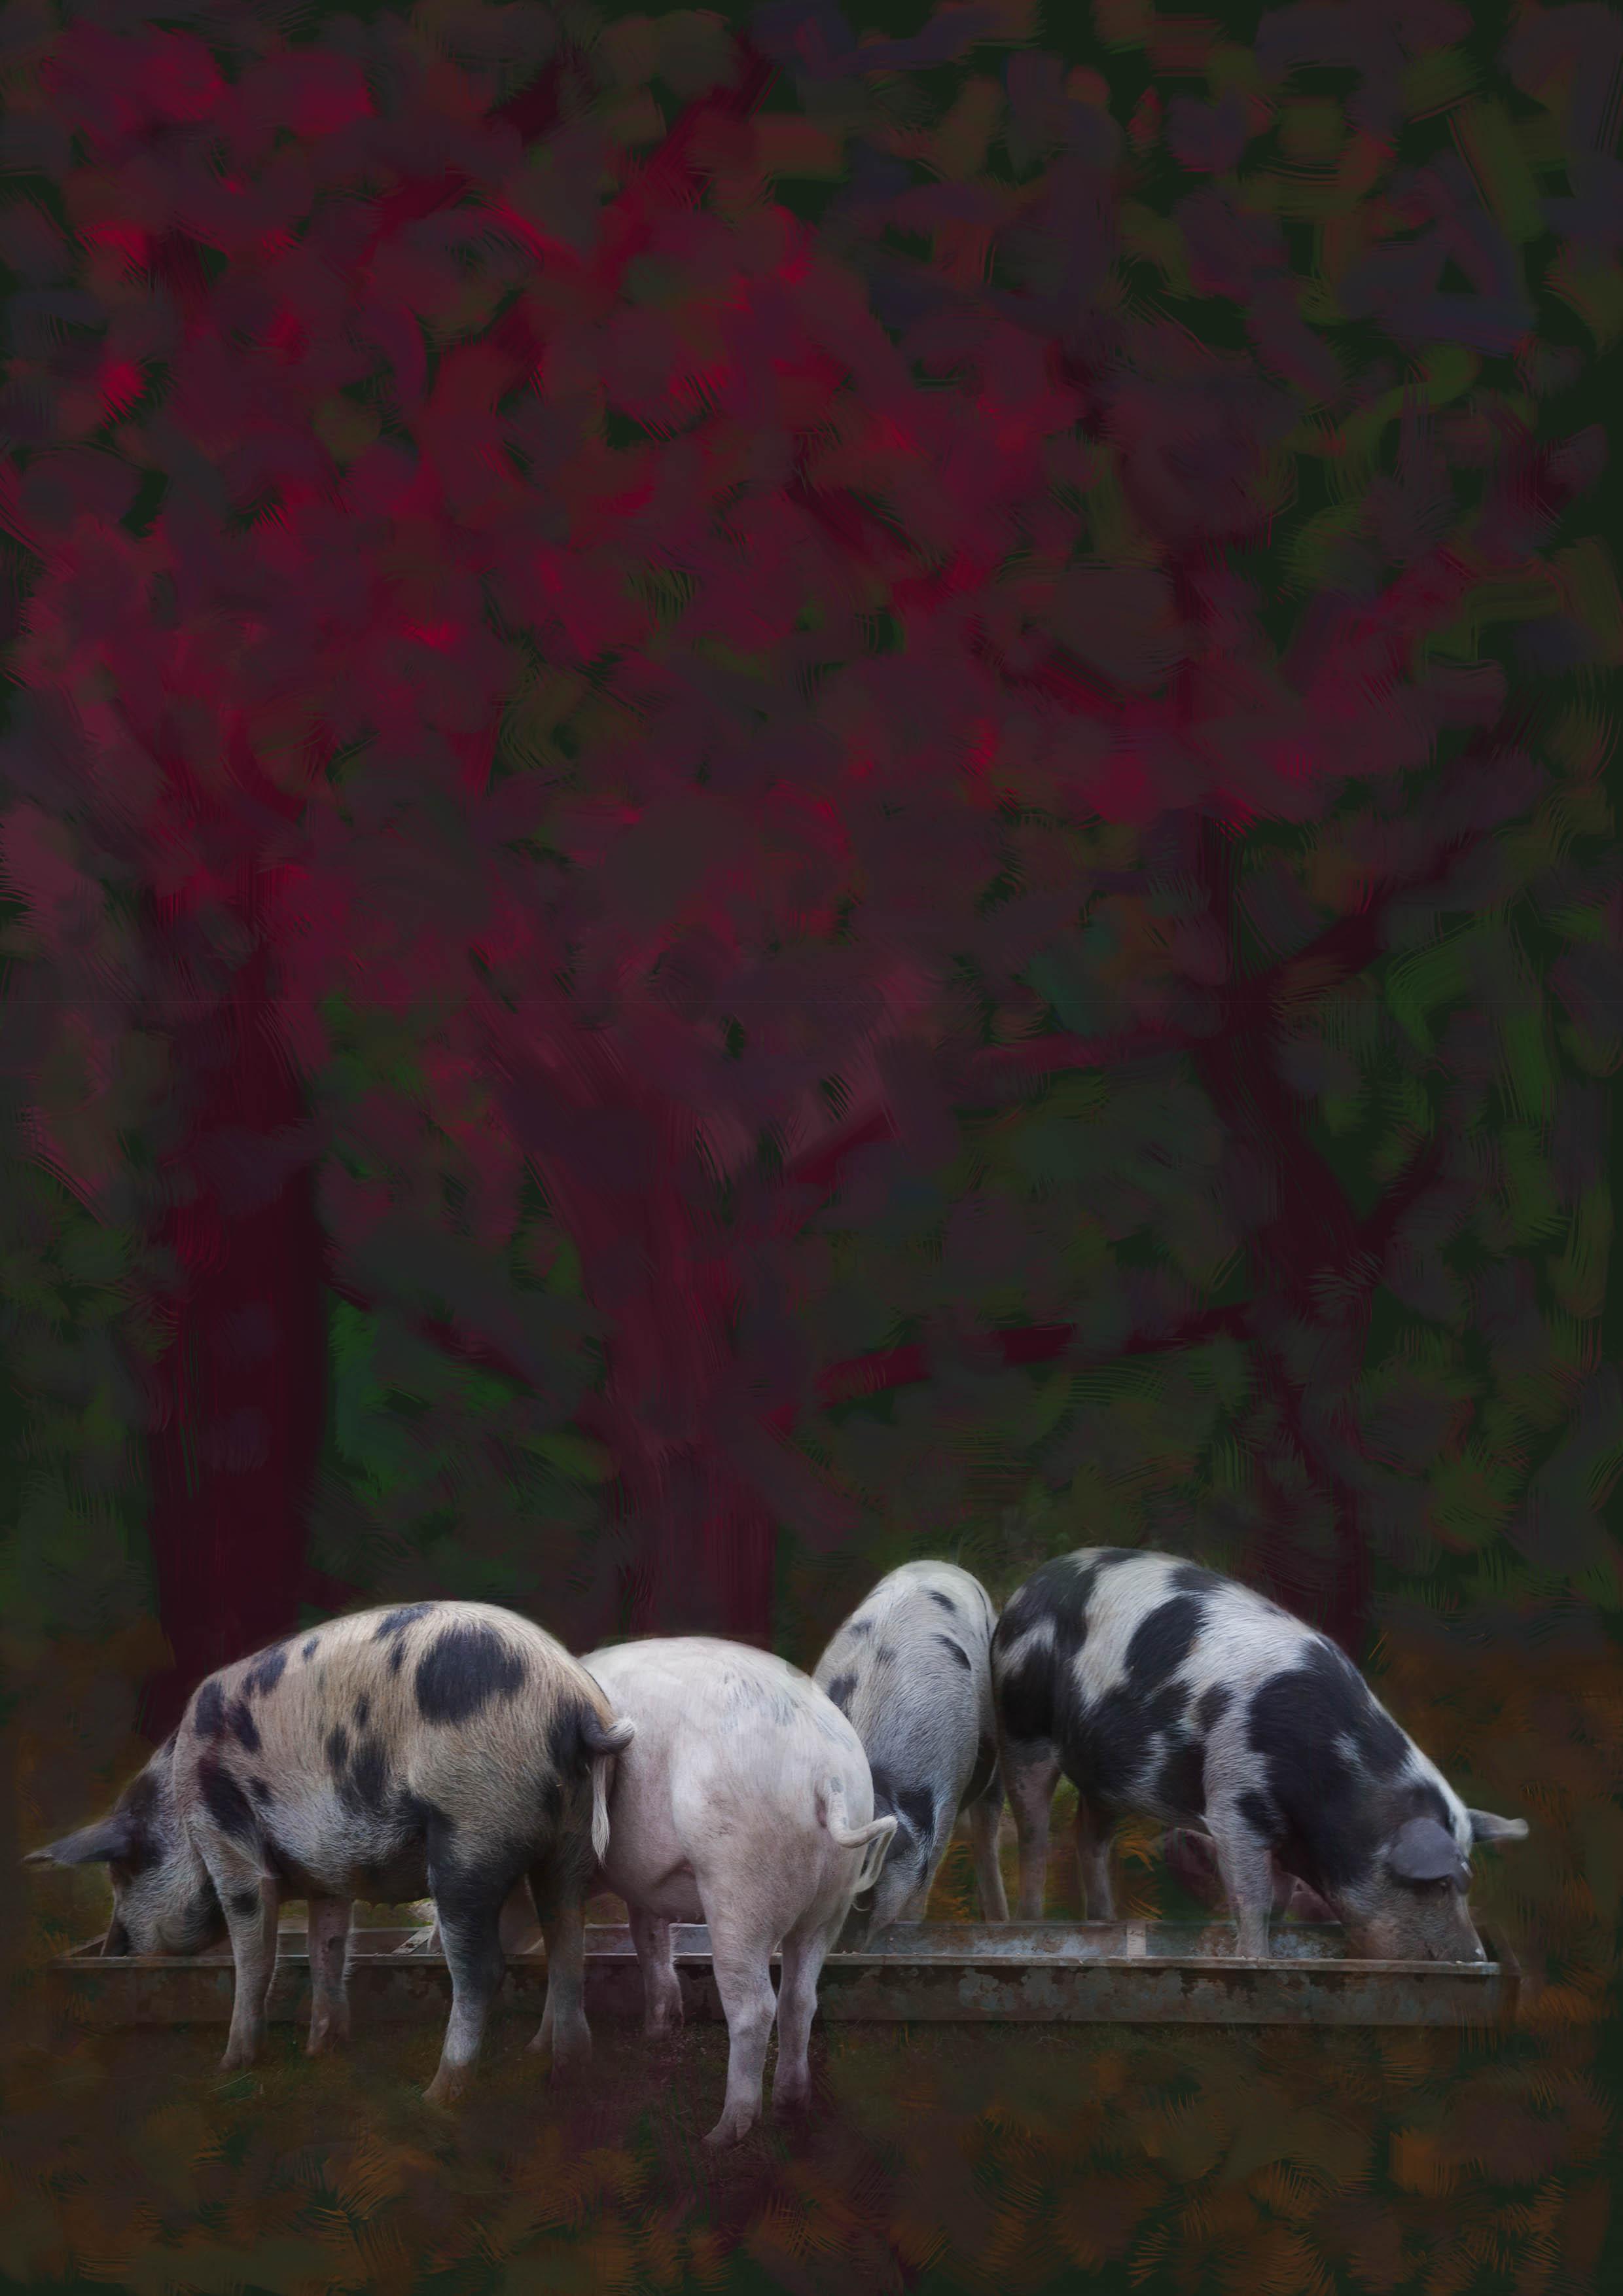 20160925-pigs-1